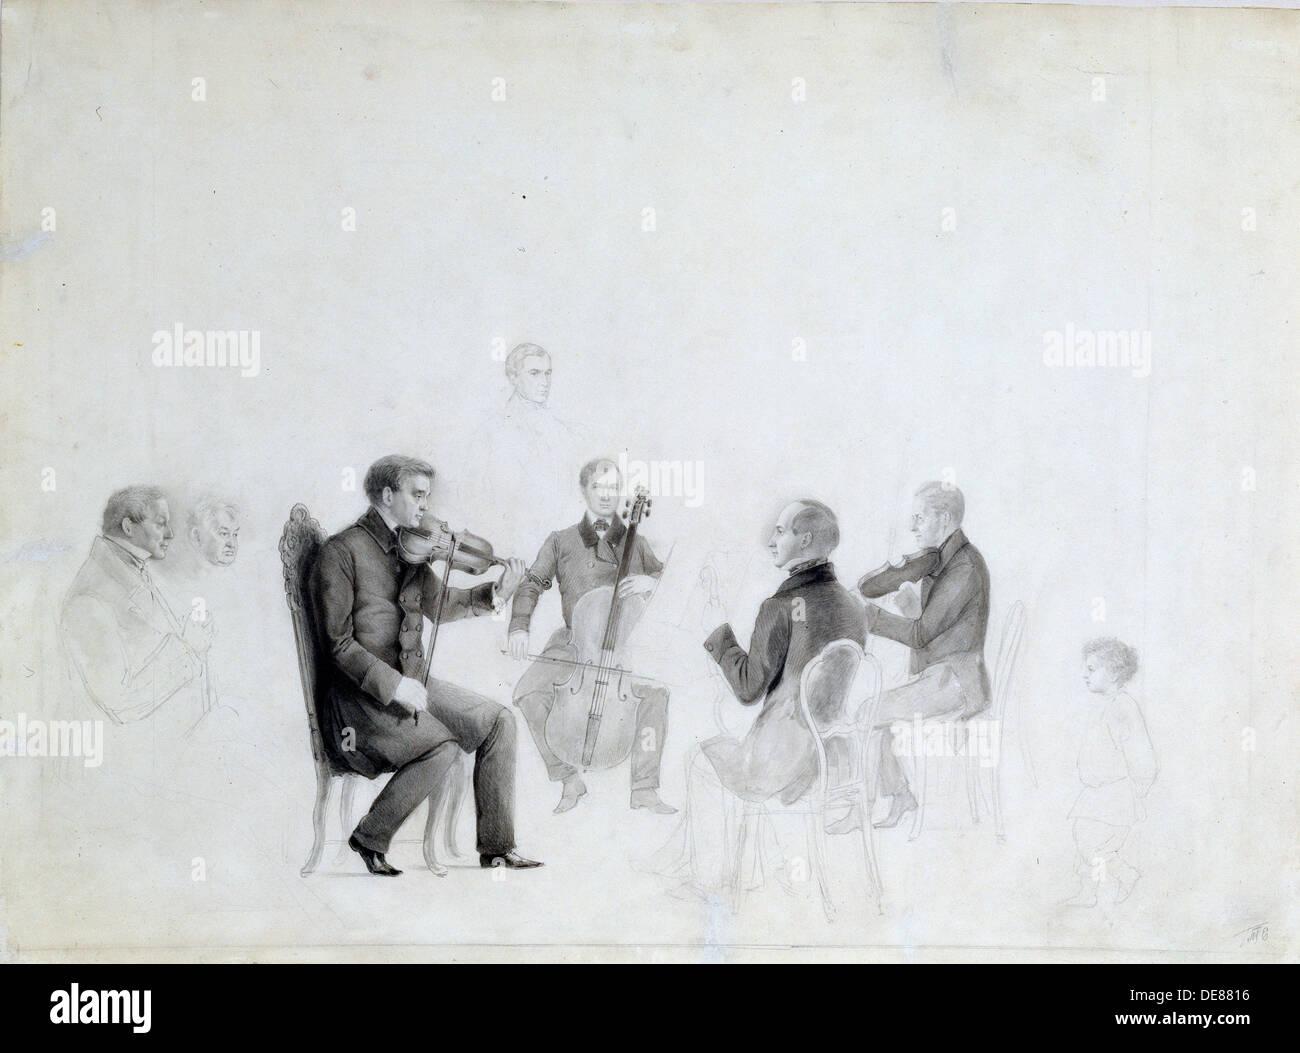 'Quartet', 1840s.  Artist: Anon - Stock Image